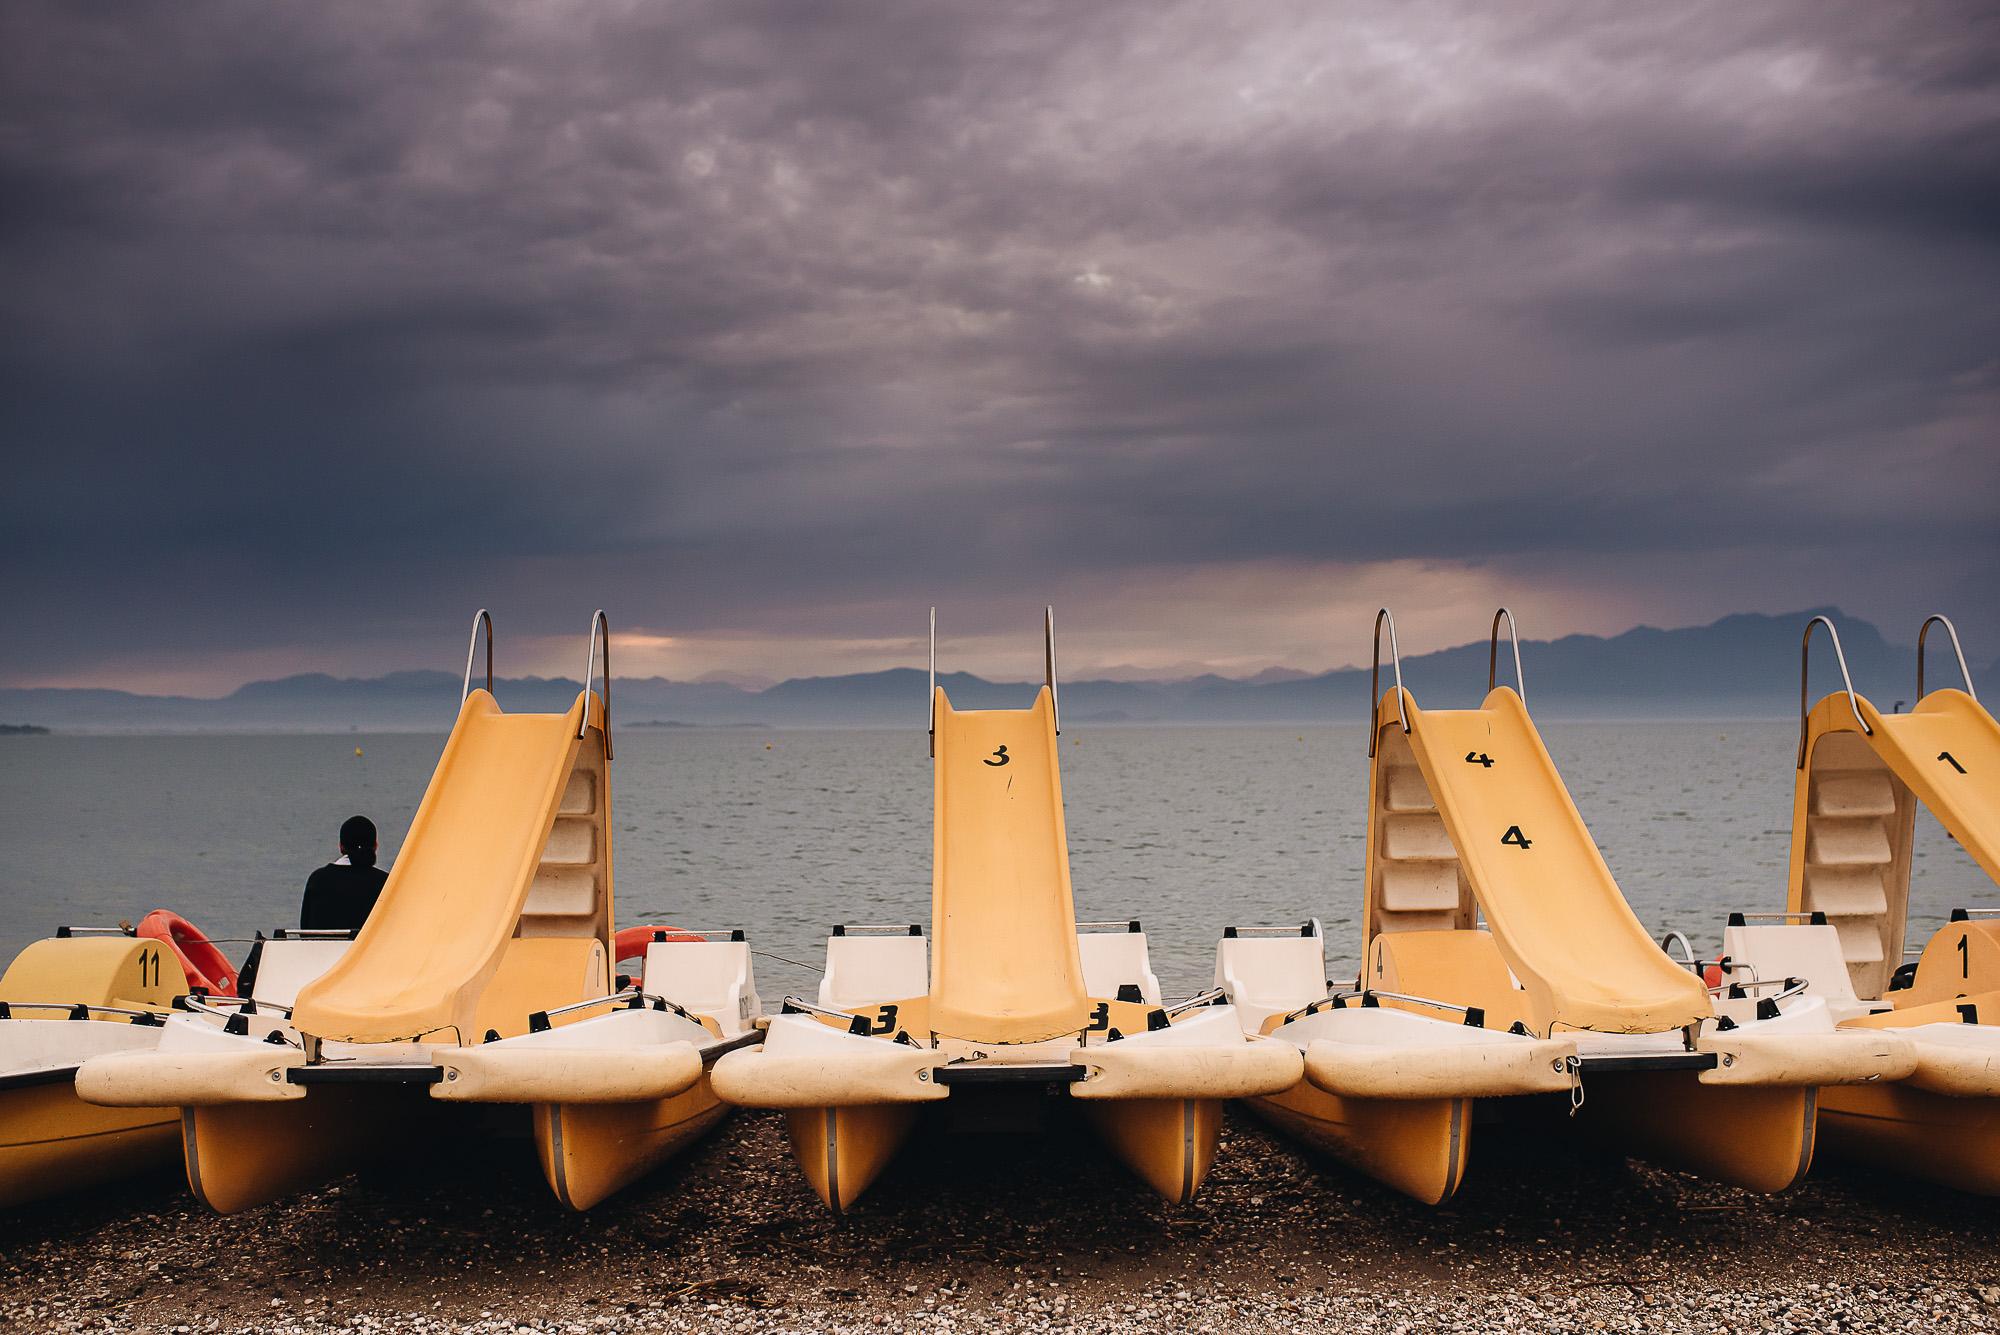 OurBeautifulAdventure-LakeGarda-Italy-Blog-2-3.jpg